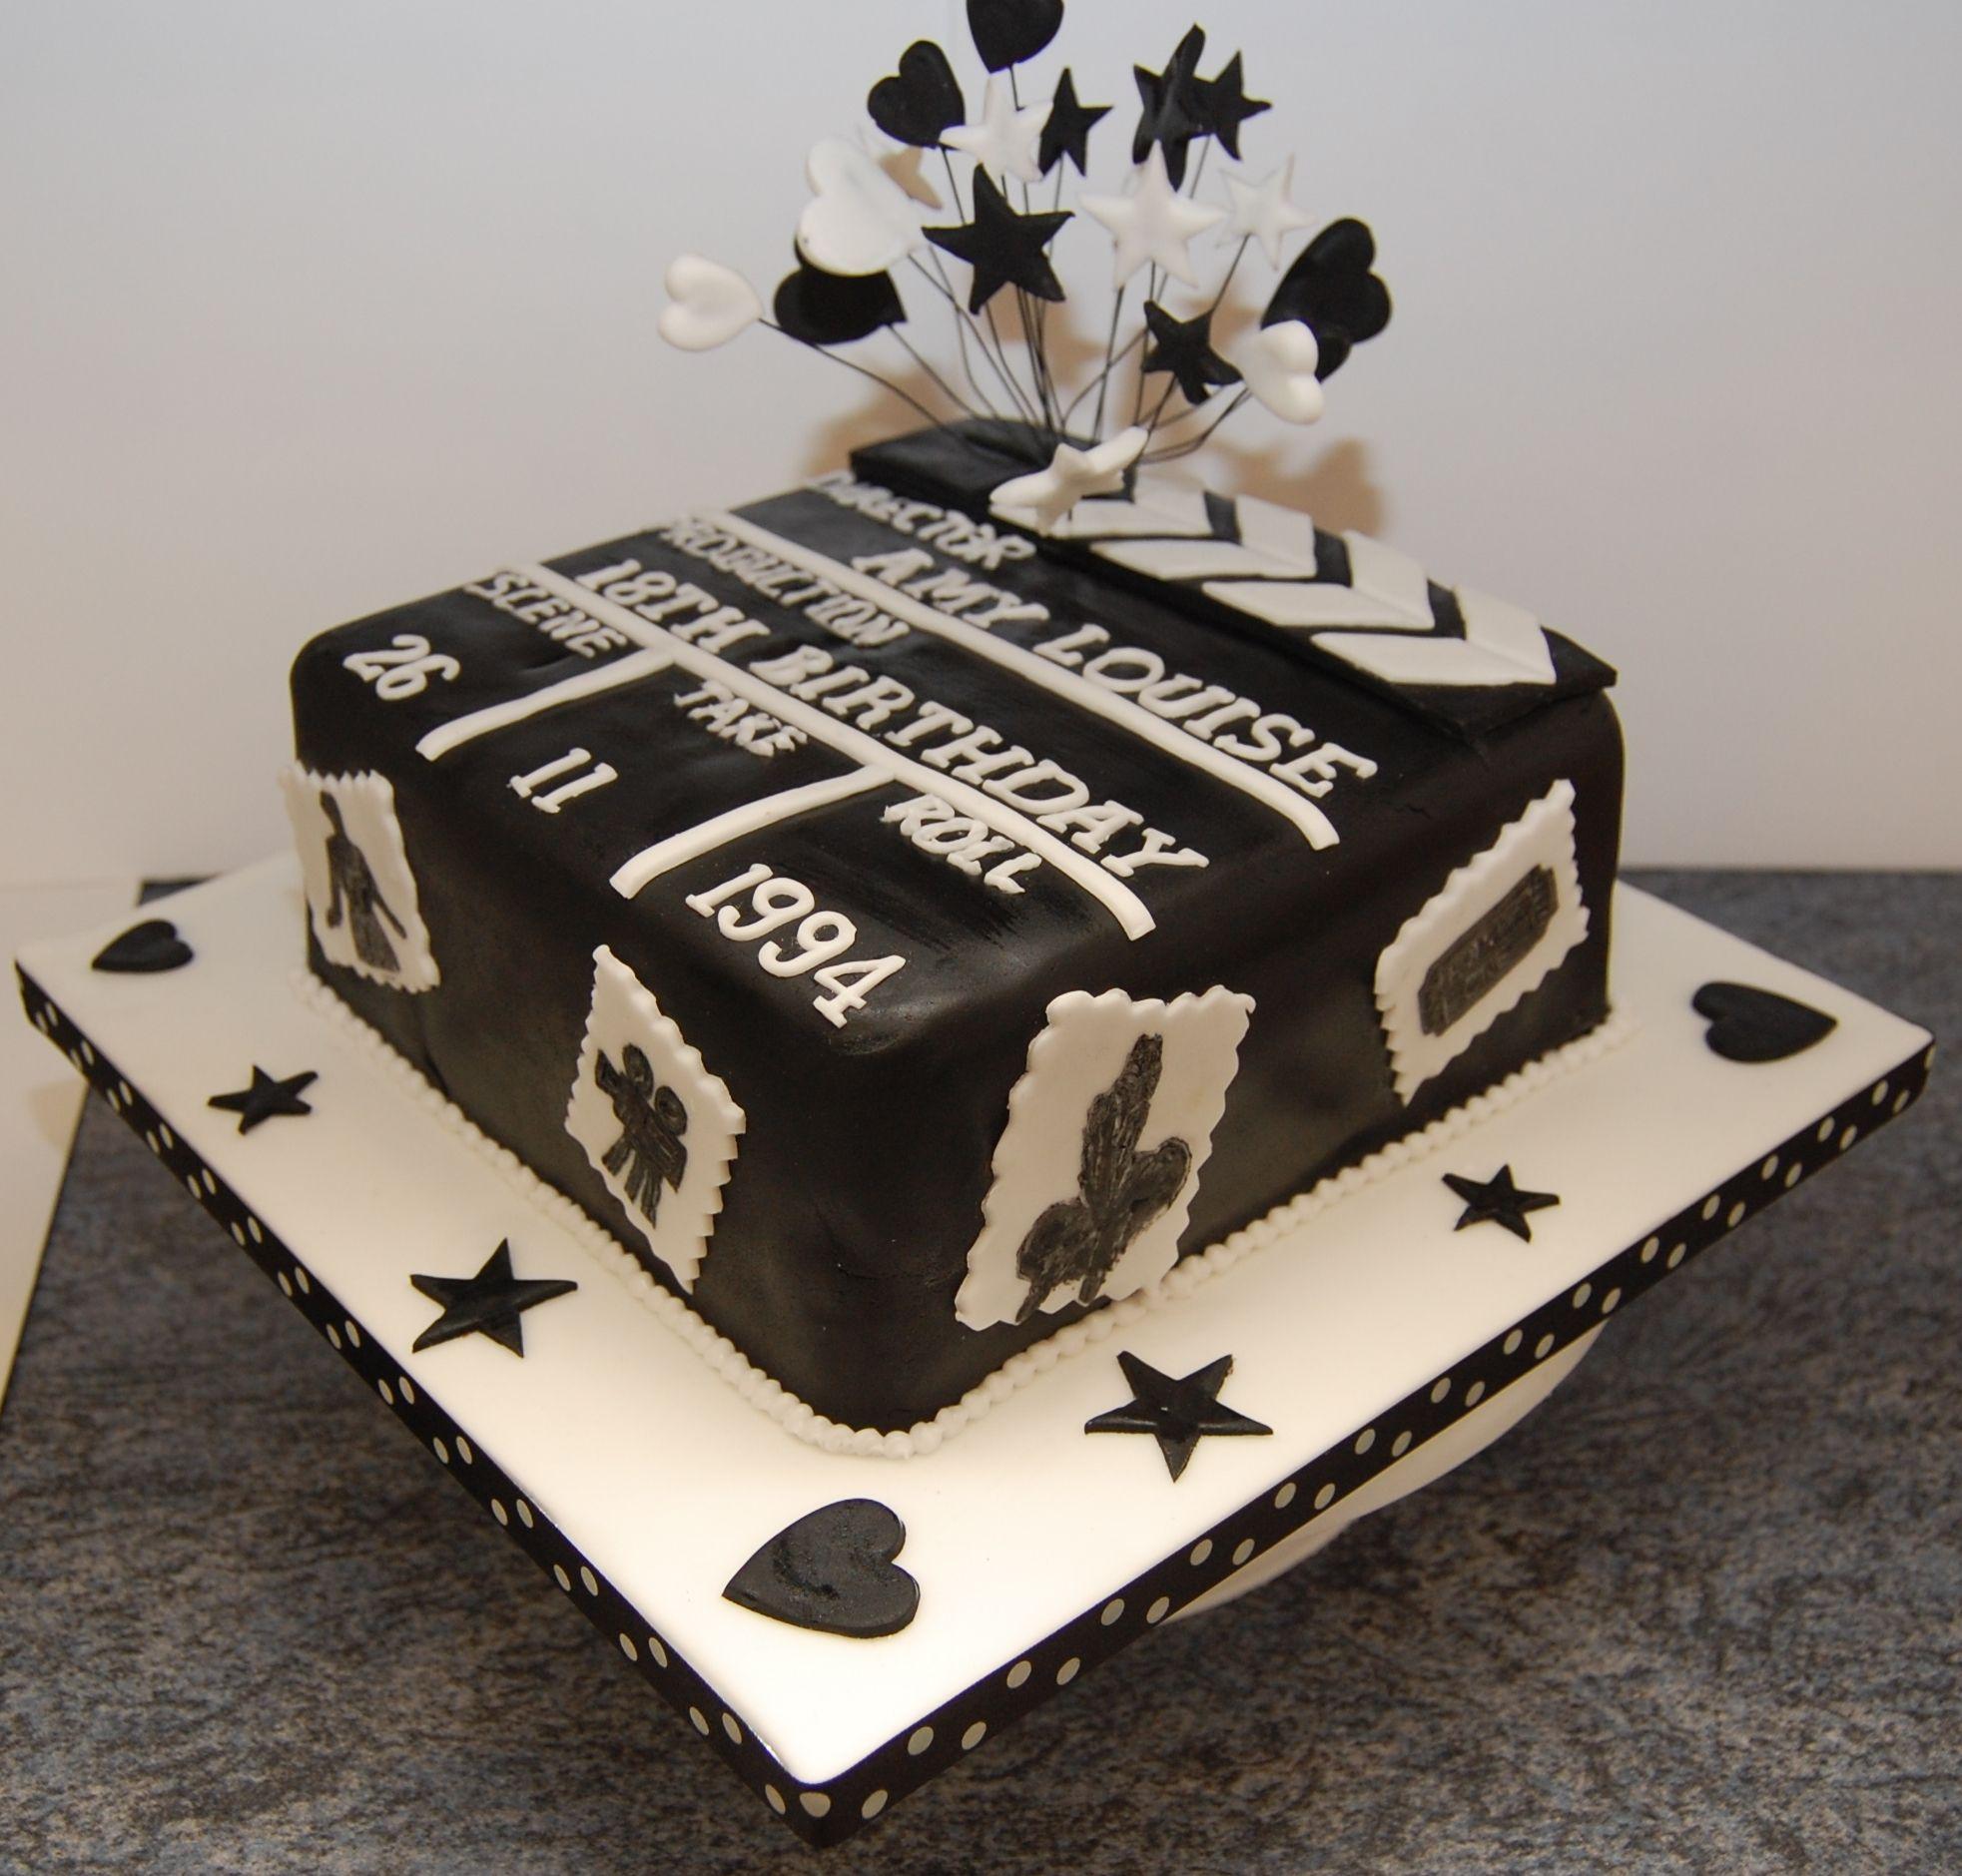 Movie Clapper Board Cakes Clapper Board Film School Graduation - Movie themed birthday cake